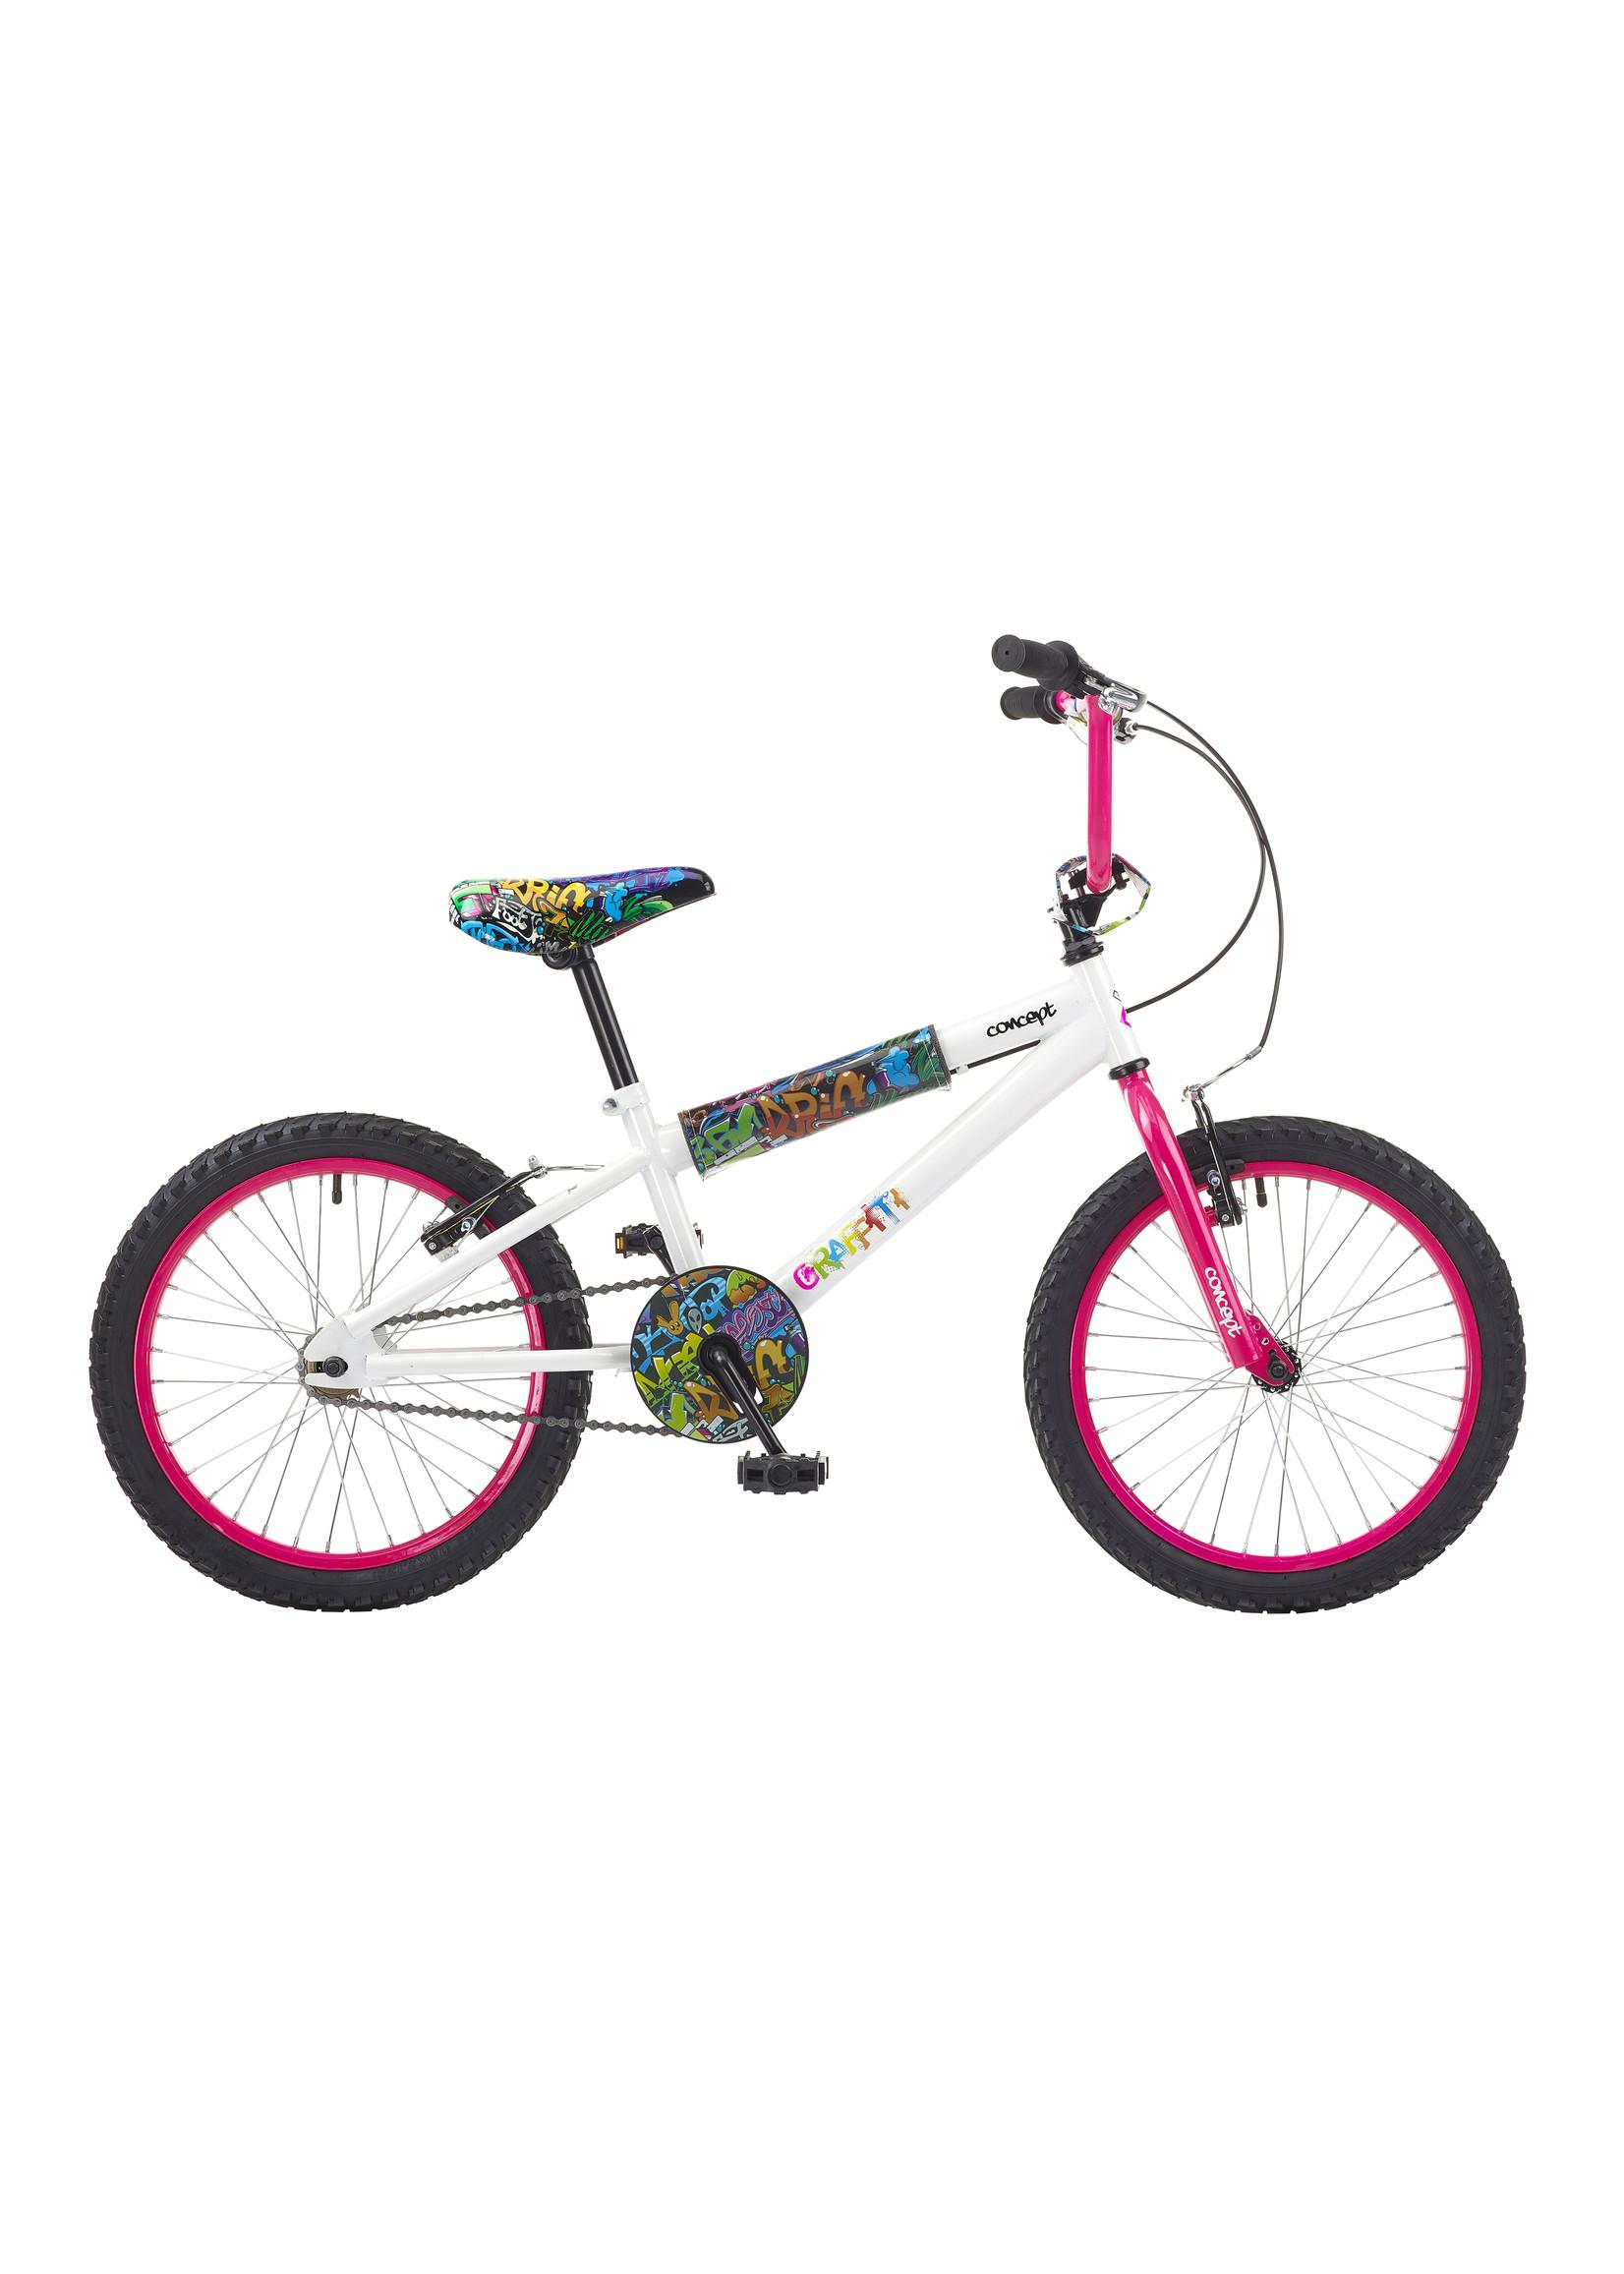 "Concept Graffiti 16"" BMX"